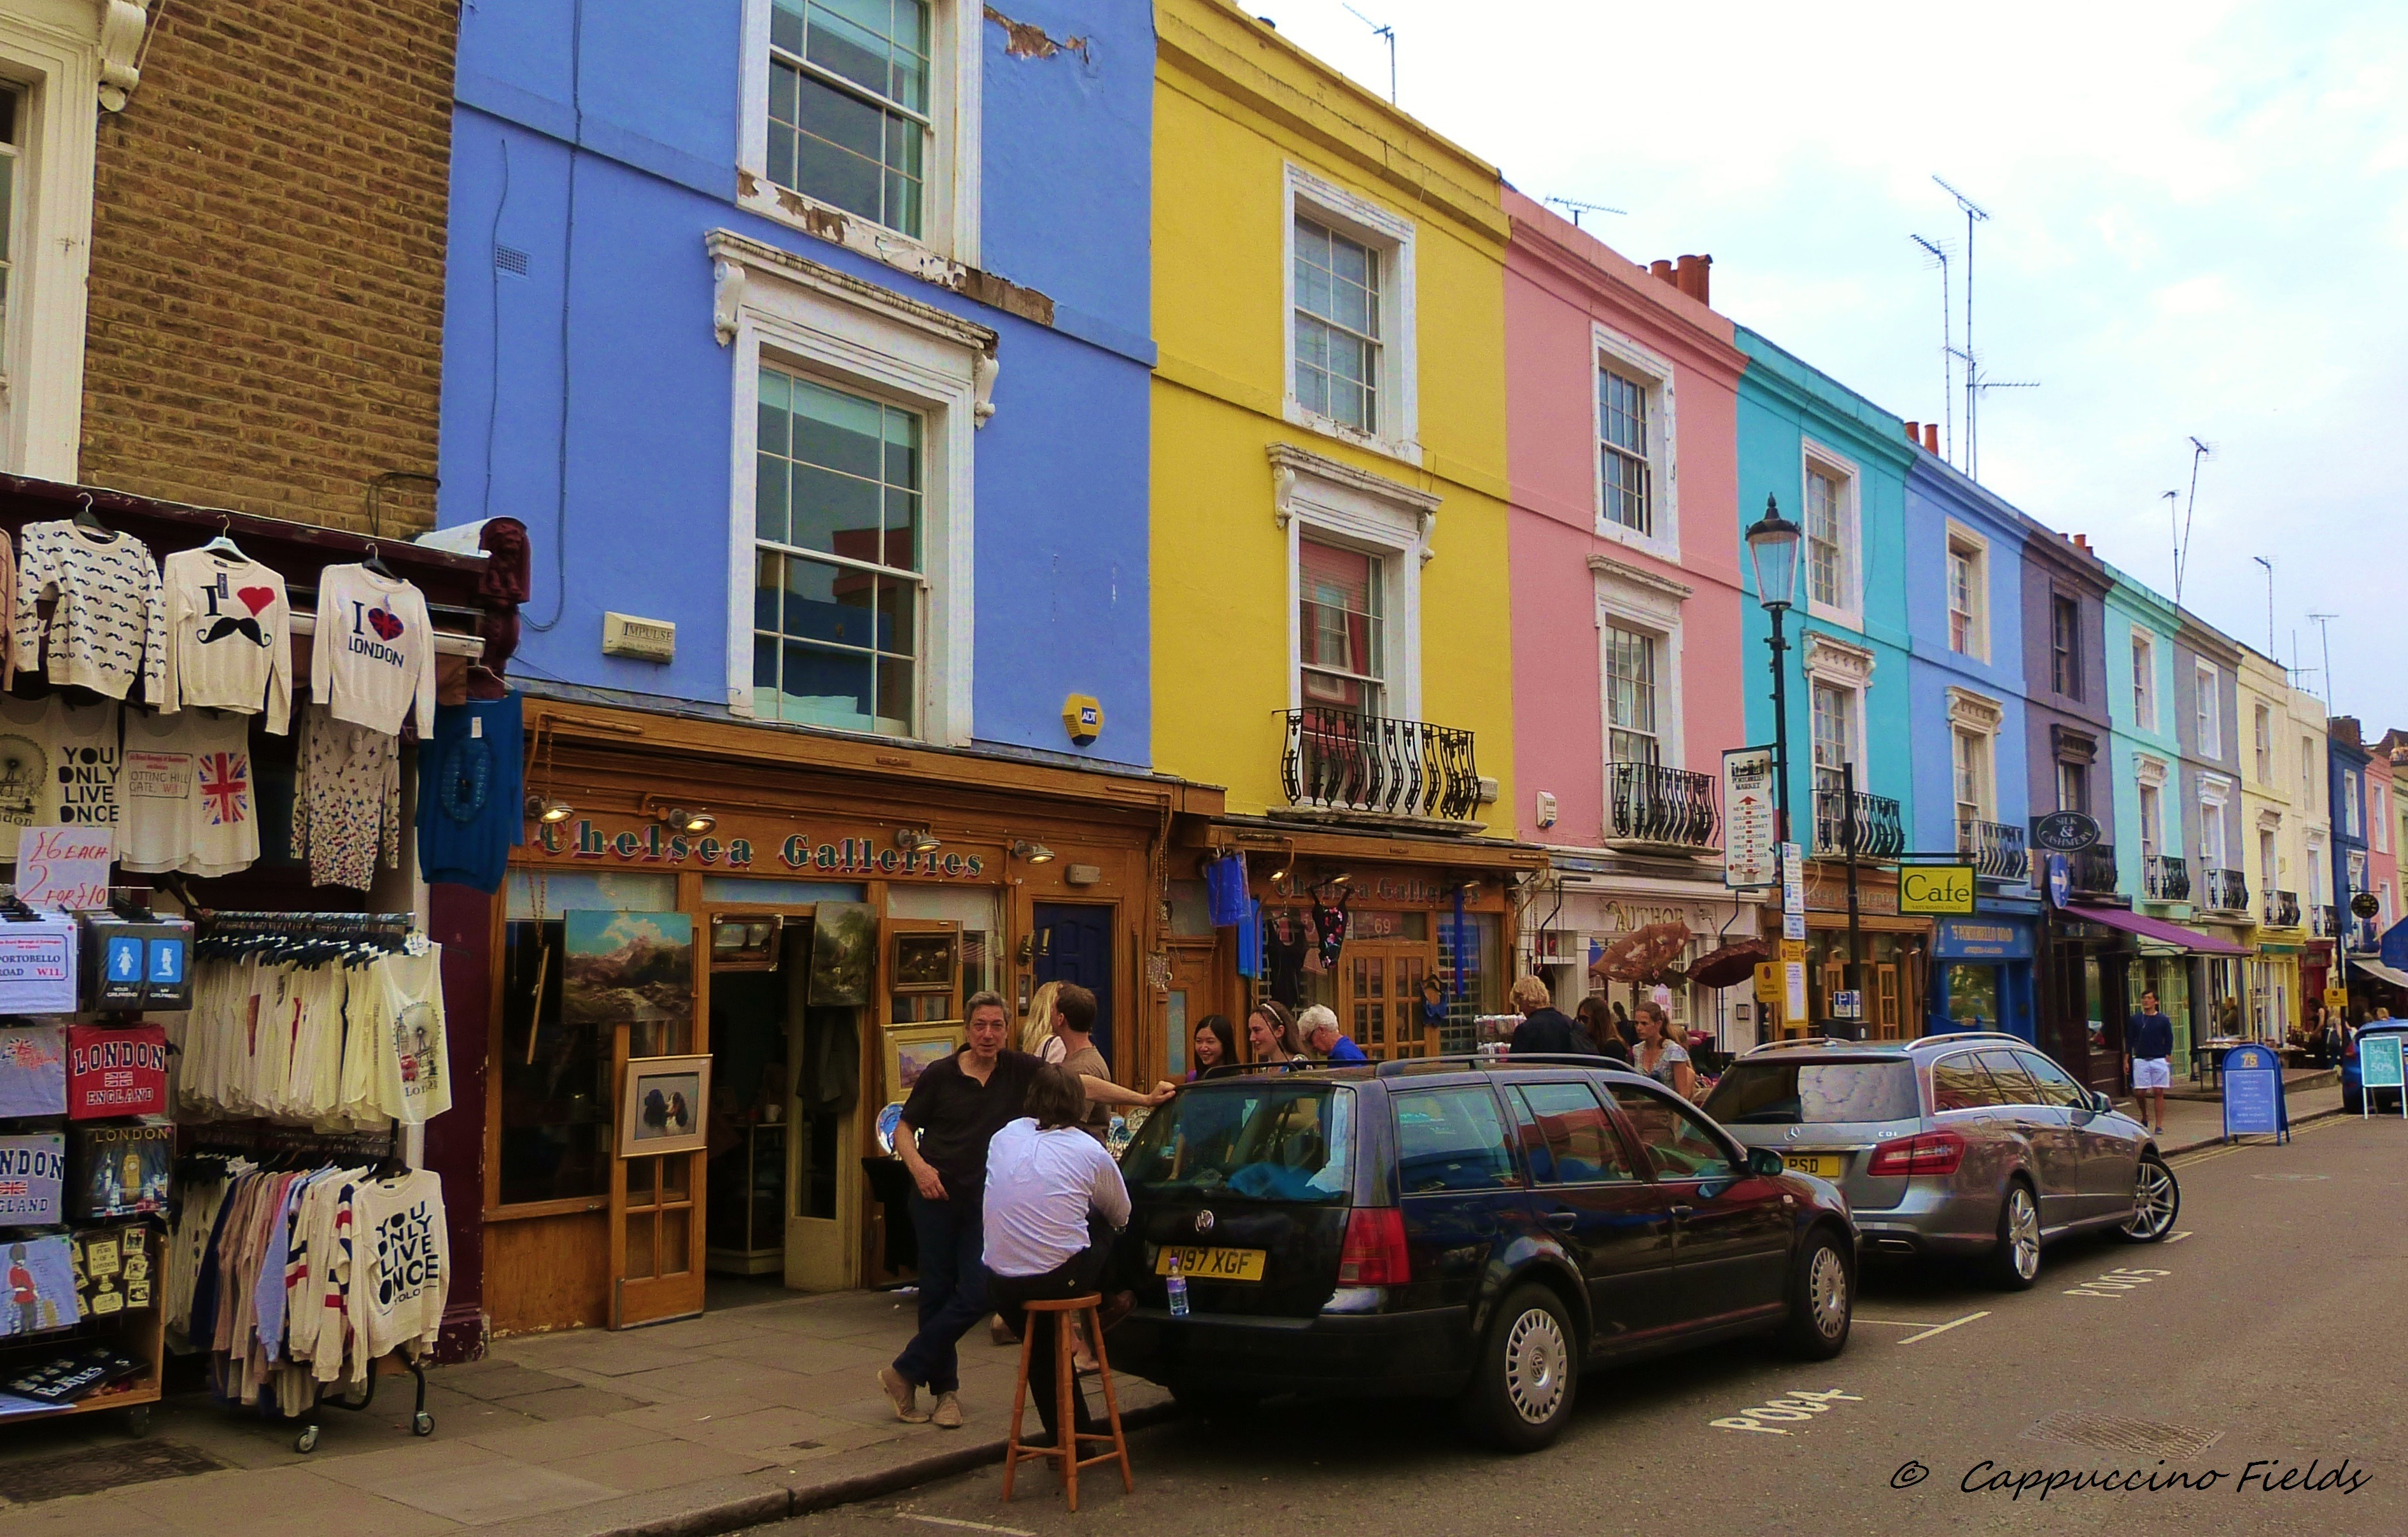 Notting Hill Ladbroke Grove 5 reasons to explore notting hill - maykenbel properties